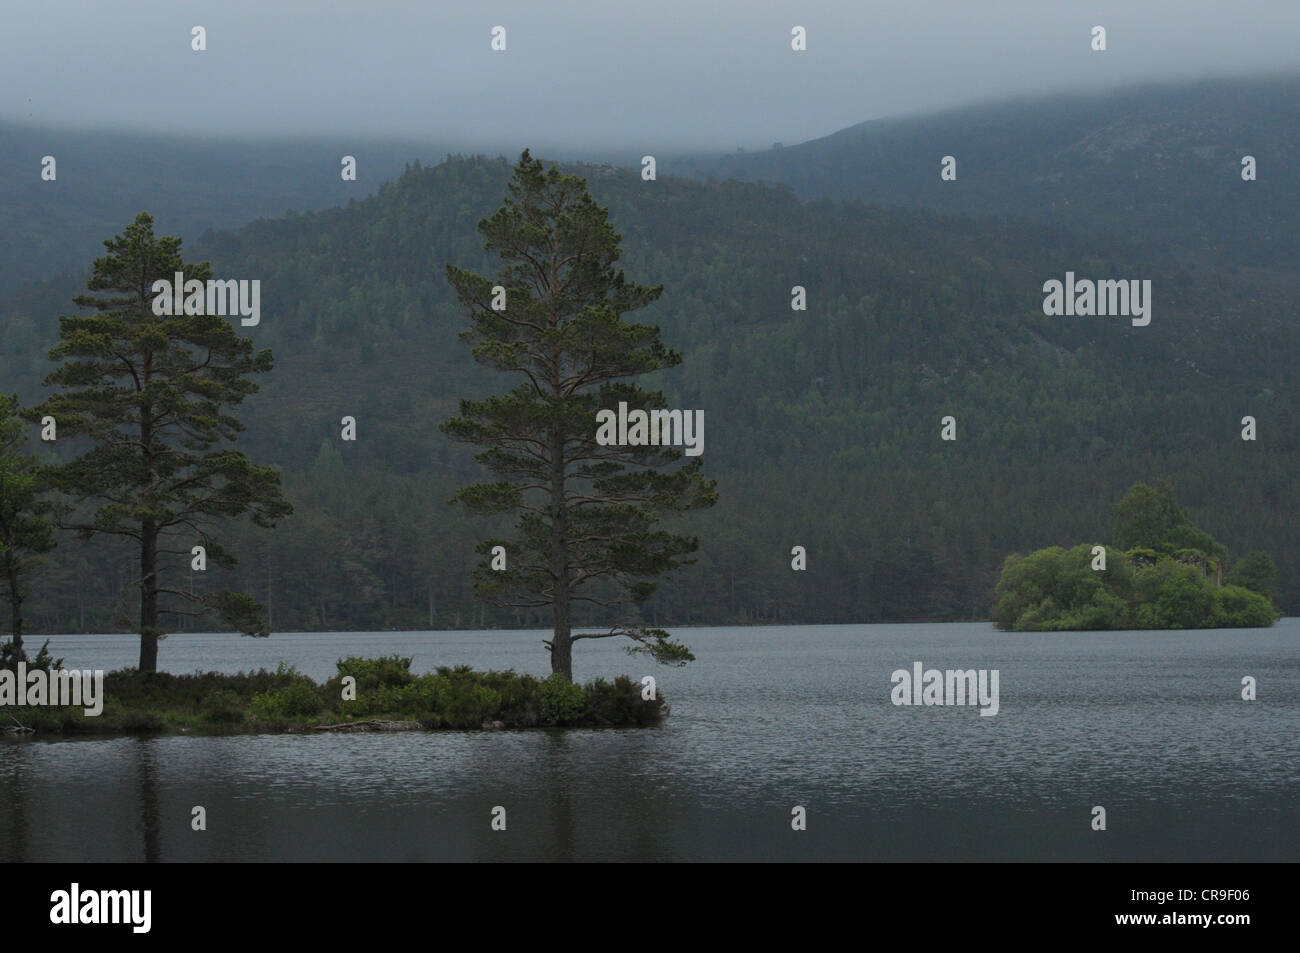 Landscape of tree at Loch an Eilein, Scotland. - Stock Image